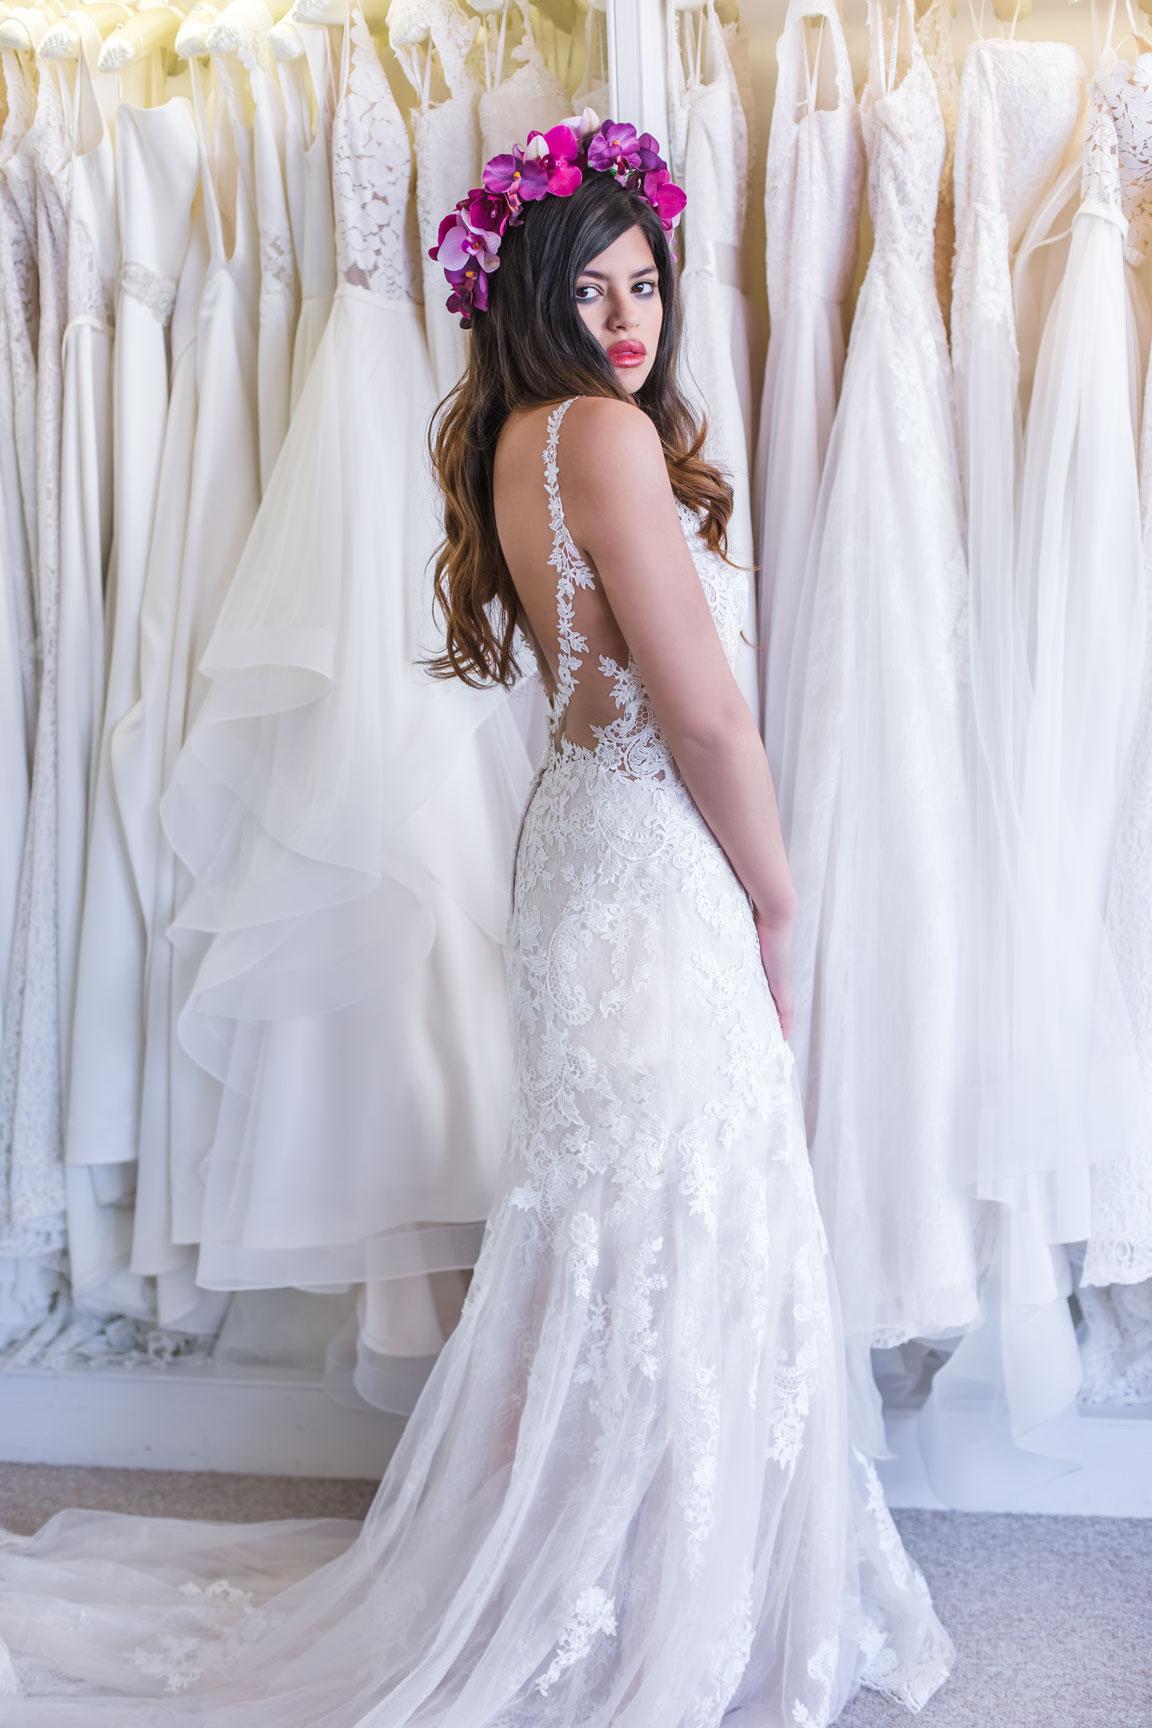 May & Grace Bridal - 3 alternative bridal looks 6 - pink flower crown